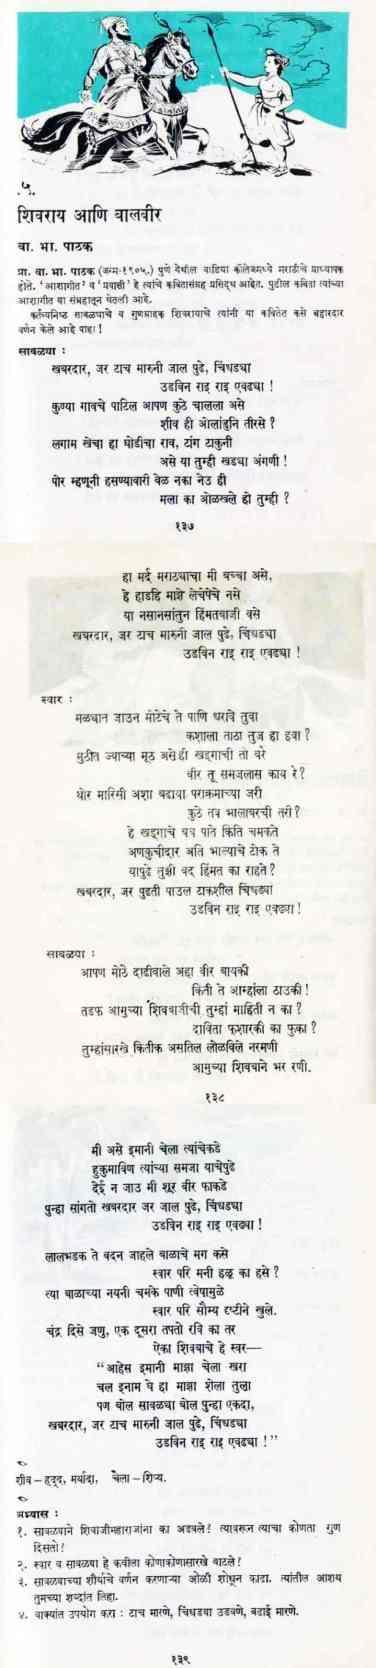 Khabardar Jar Taach Maruni - खबरदार जर टाच मारुनी- Balbharati Poem Songs